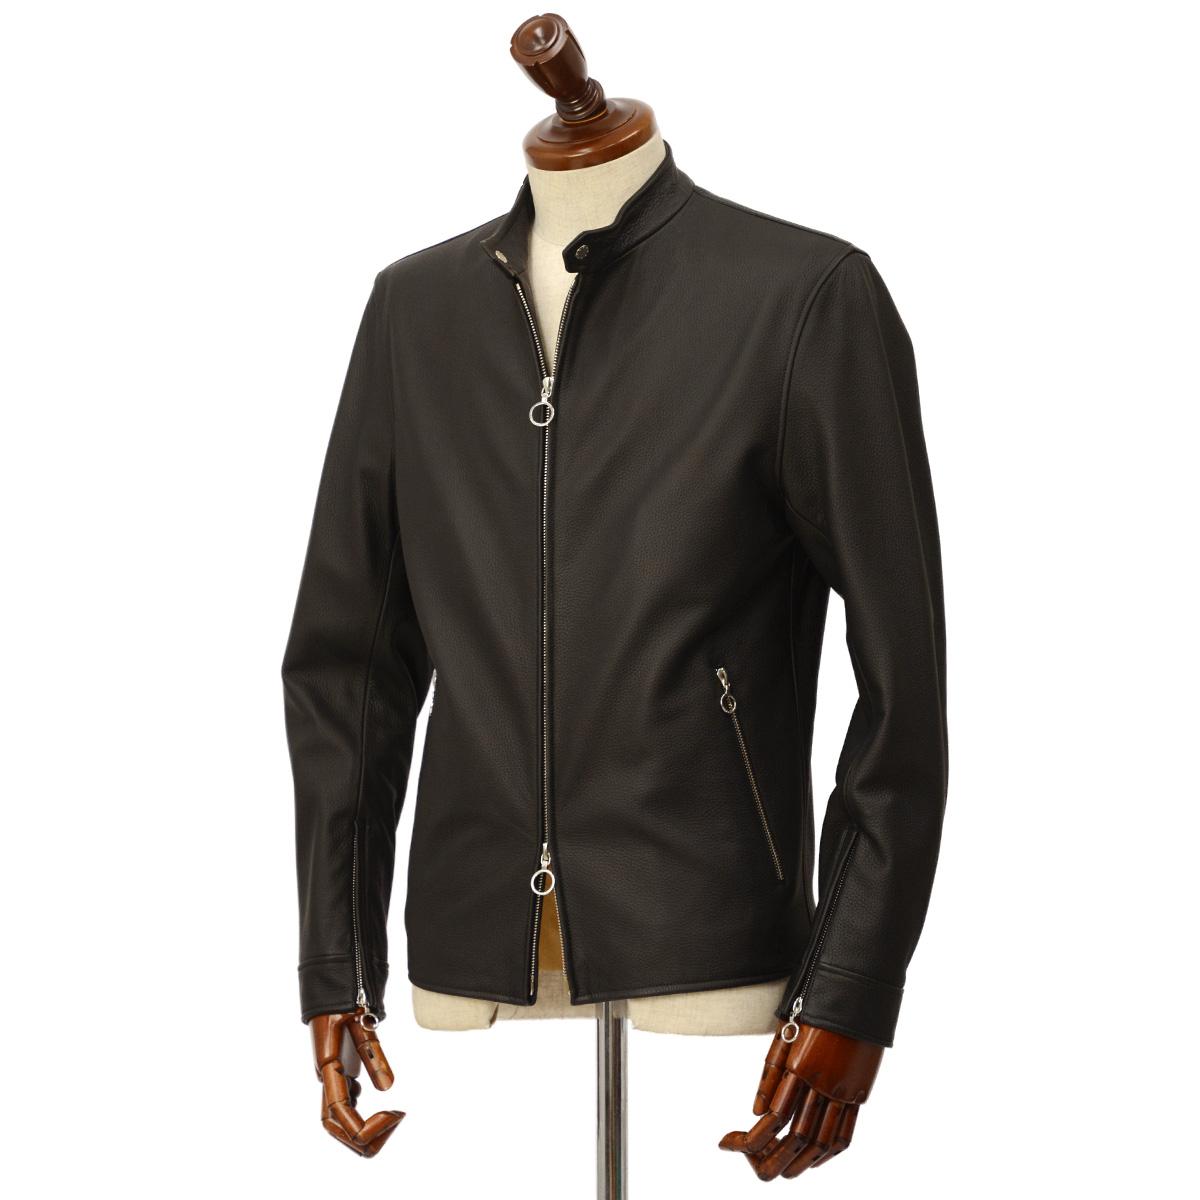 SERAPHIN【セラファン】 シングルライダースジャケット BIKER ANDY 129 00 CERF NOIR ディアスキン ブラック